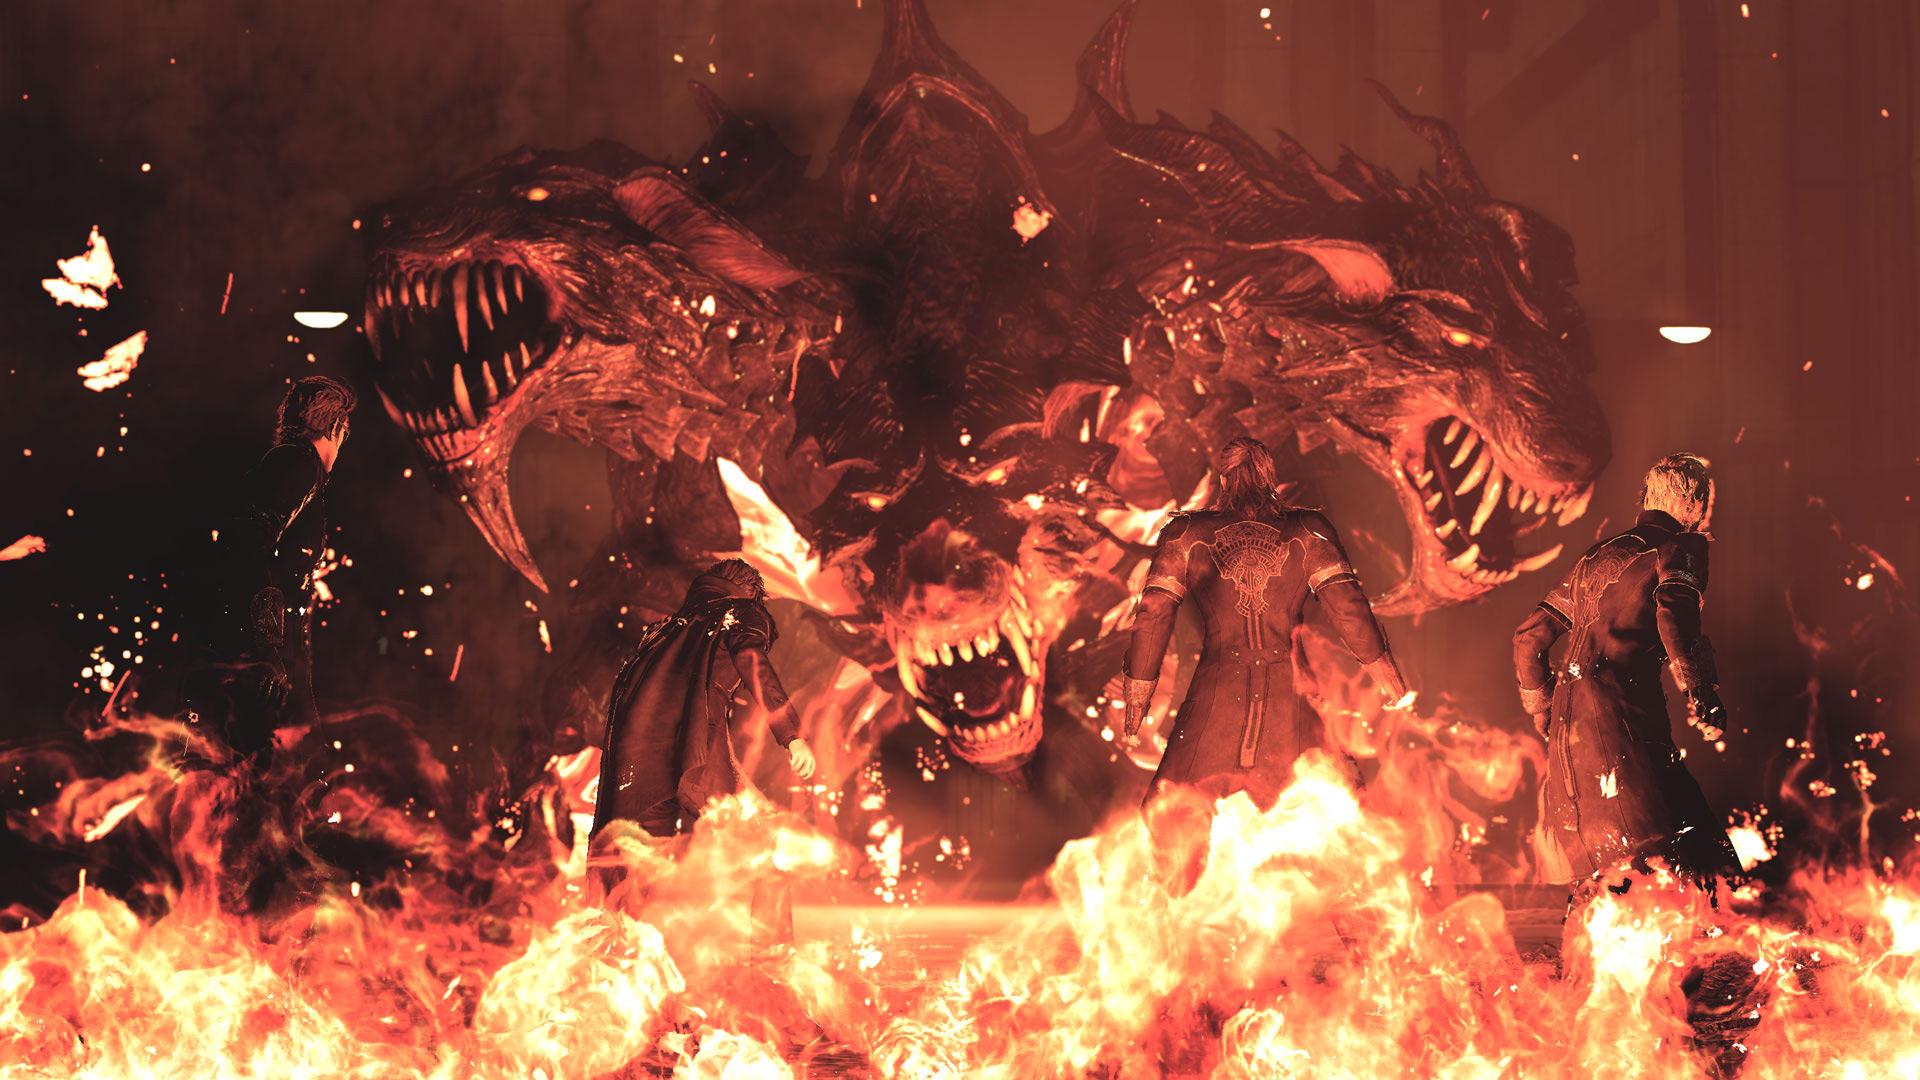 Final Fantasy XV: Windows Edition and Royal Edition coming this March screenshot